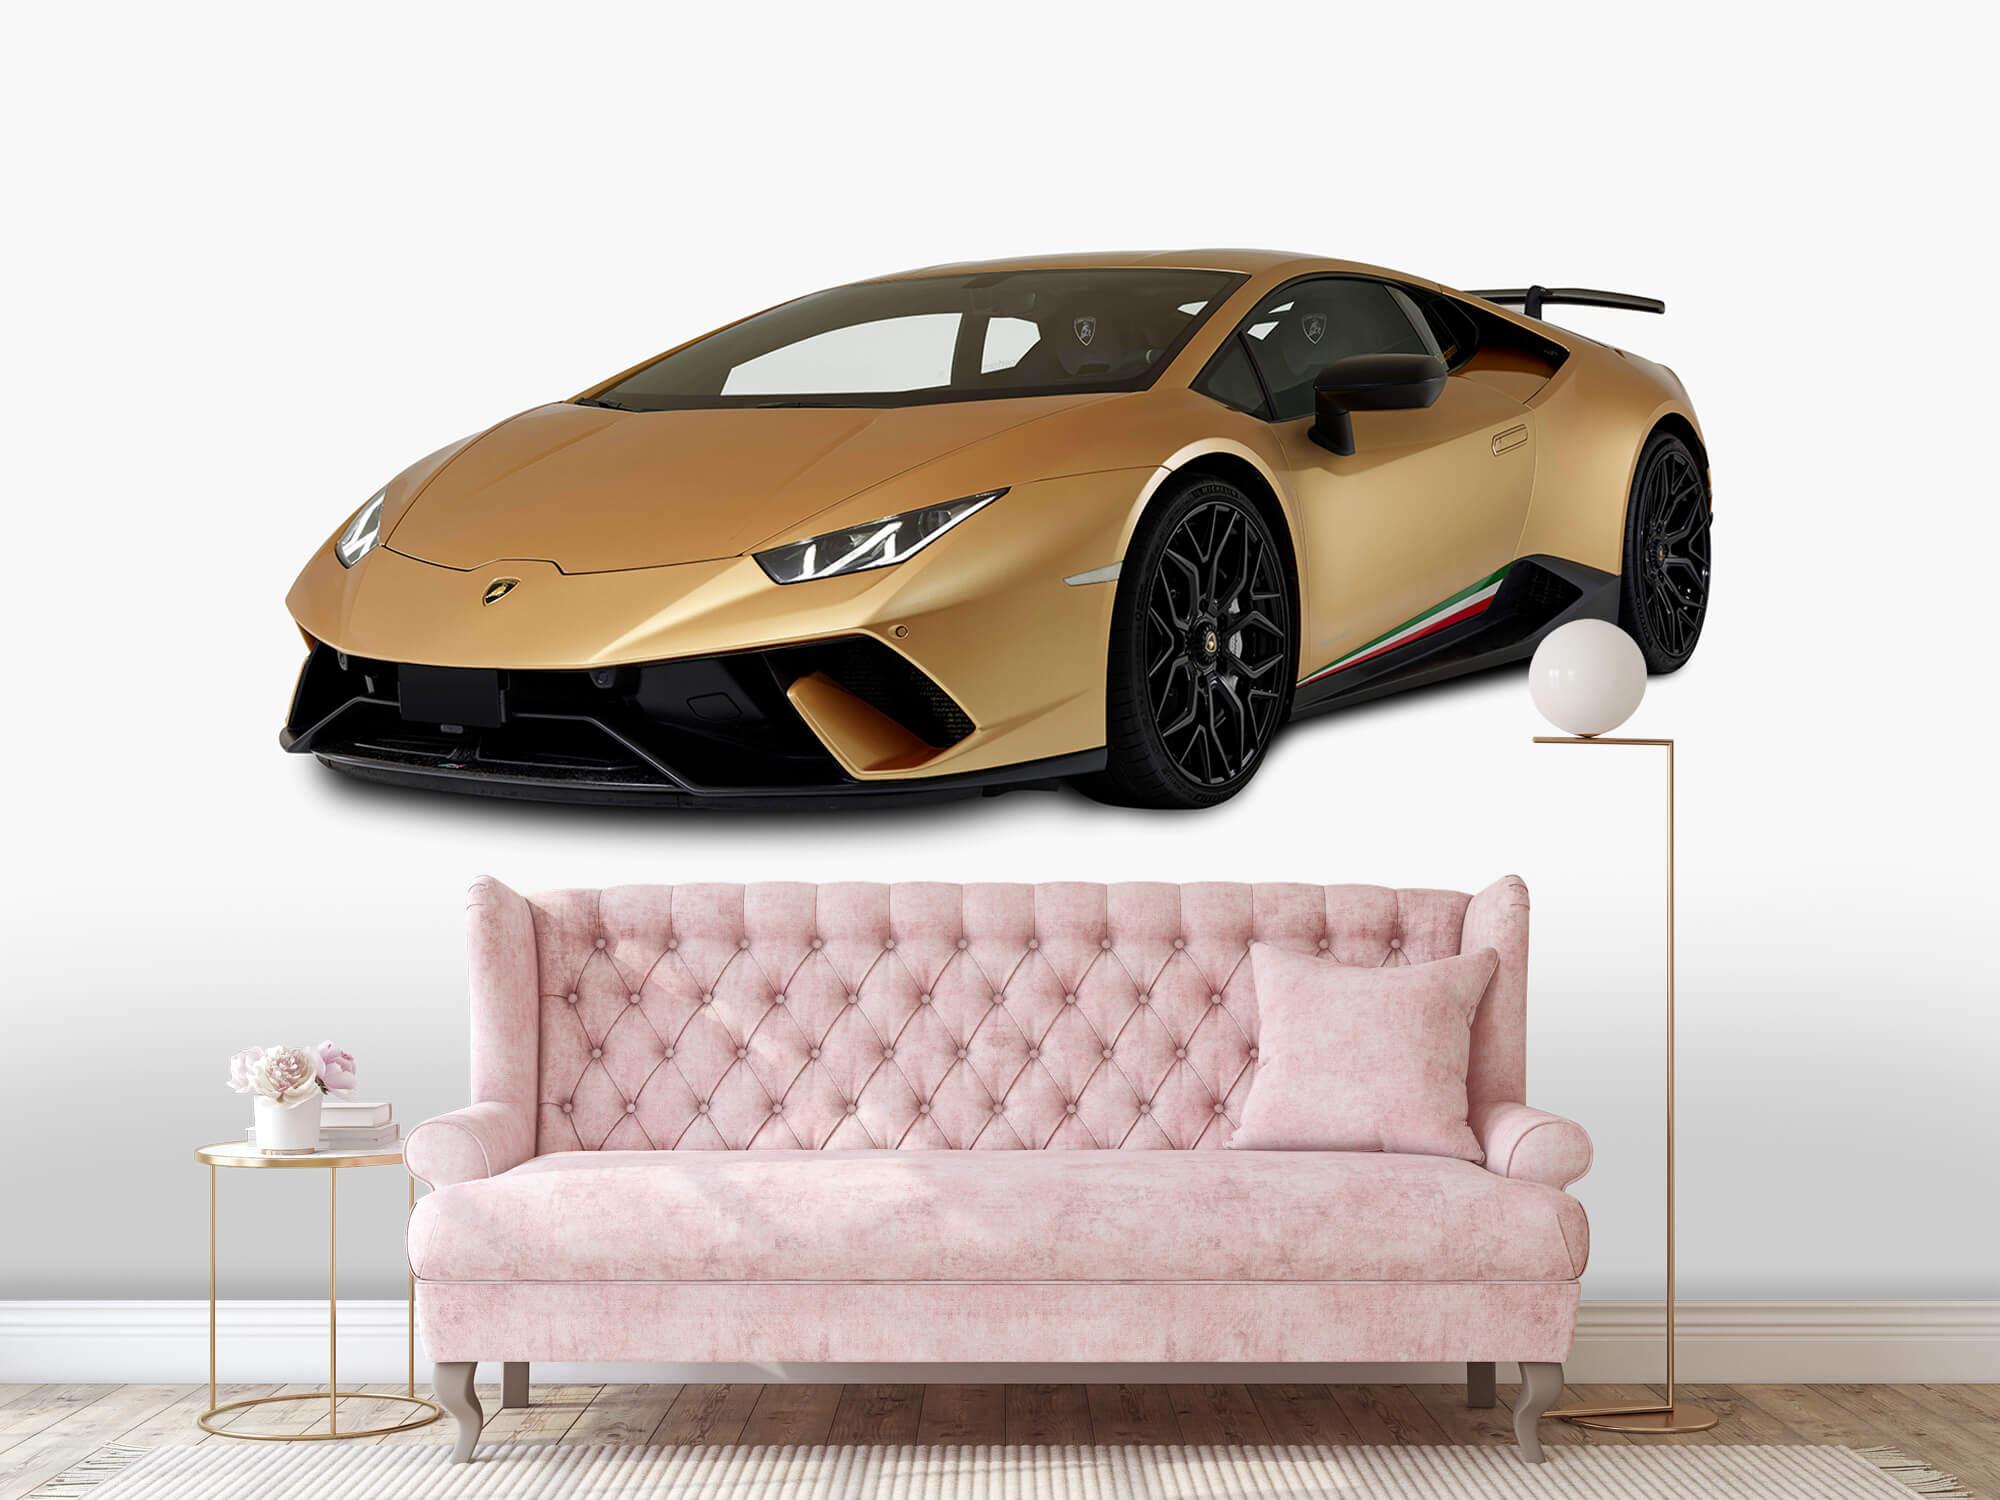 Wallpaper Lamborghini Huracán - Rechter voorkant wit 12